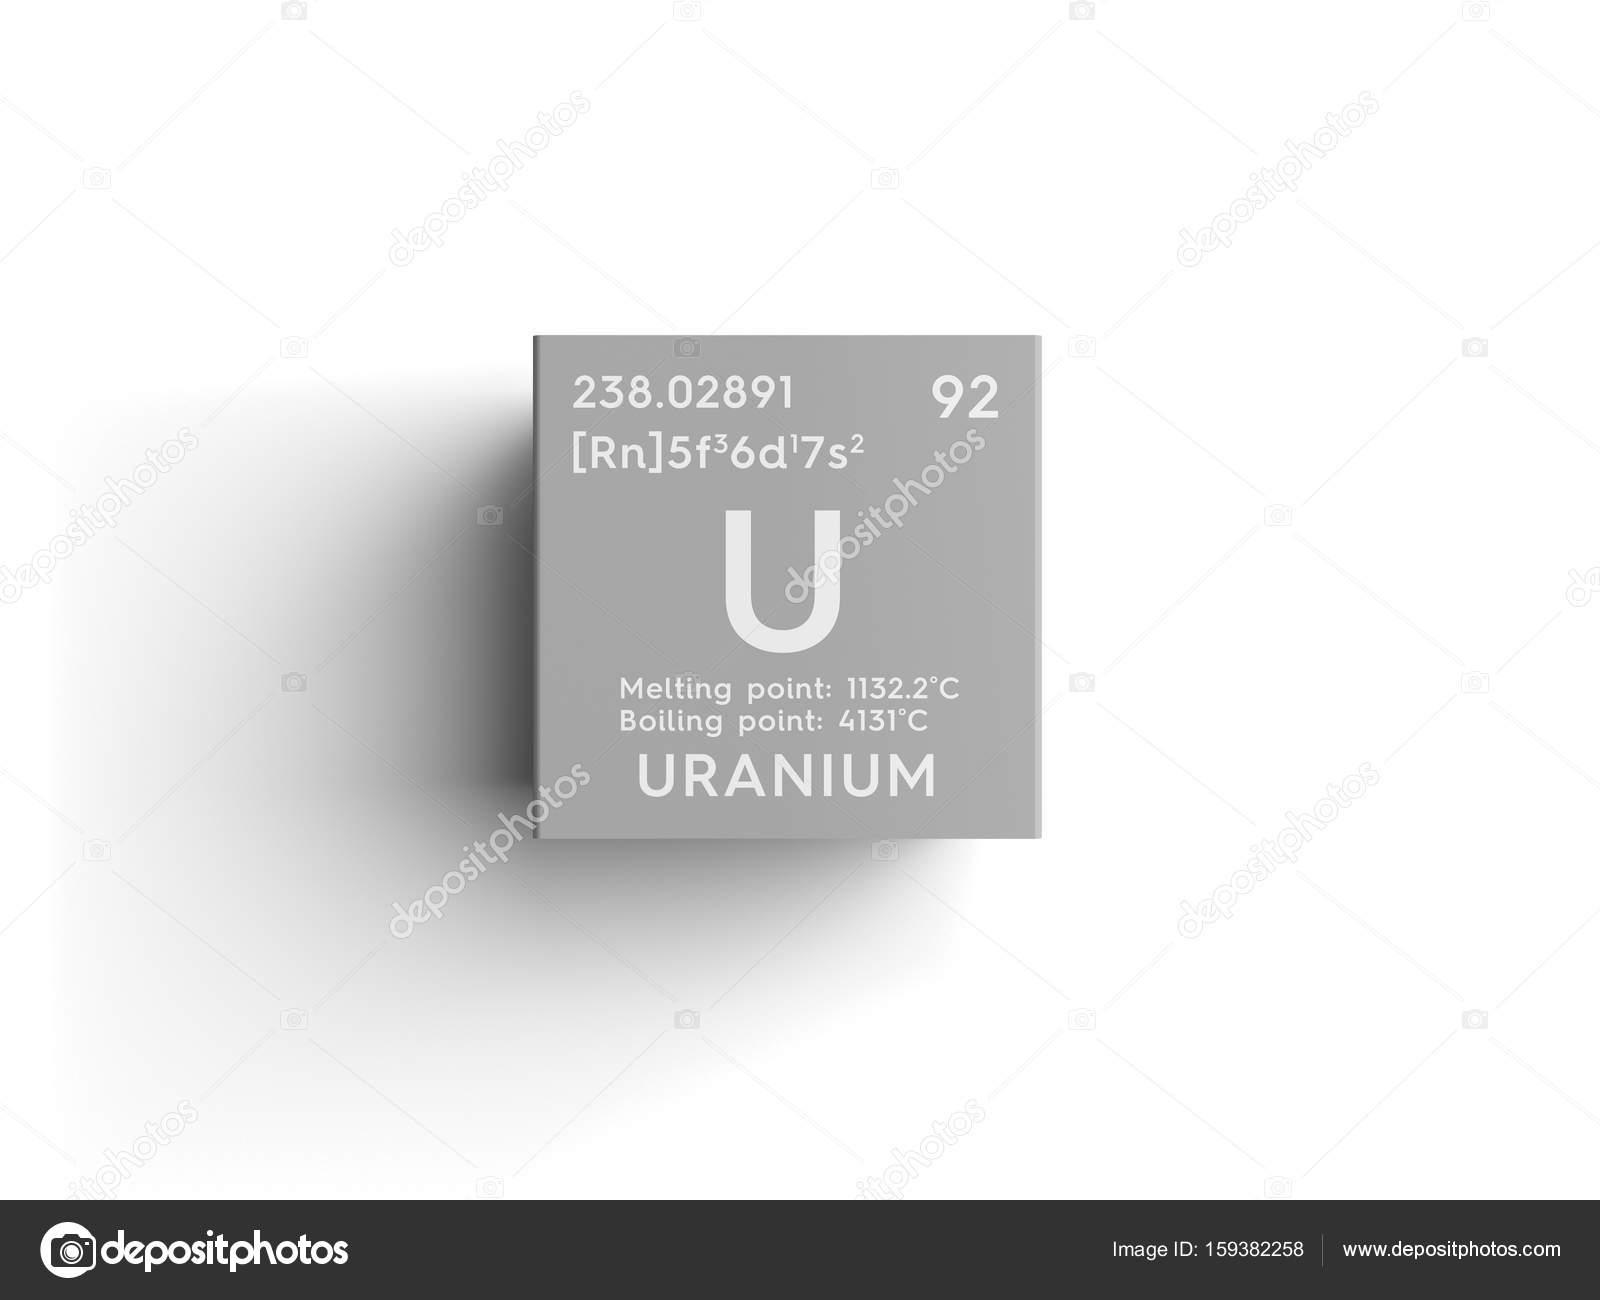 Uranium actinoids chemical element of mendeleevs periodic table uranium actinoids chemical element of mendeleevs periodic table uranium in square cube creative concept photo by sanches812 urtaz Choice Image